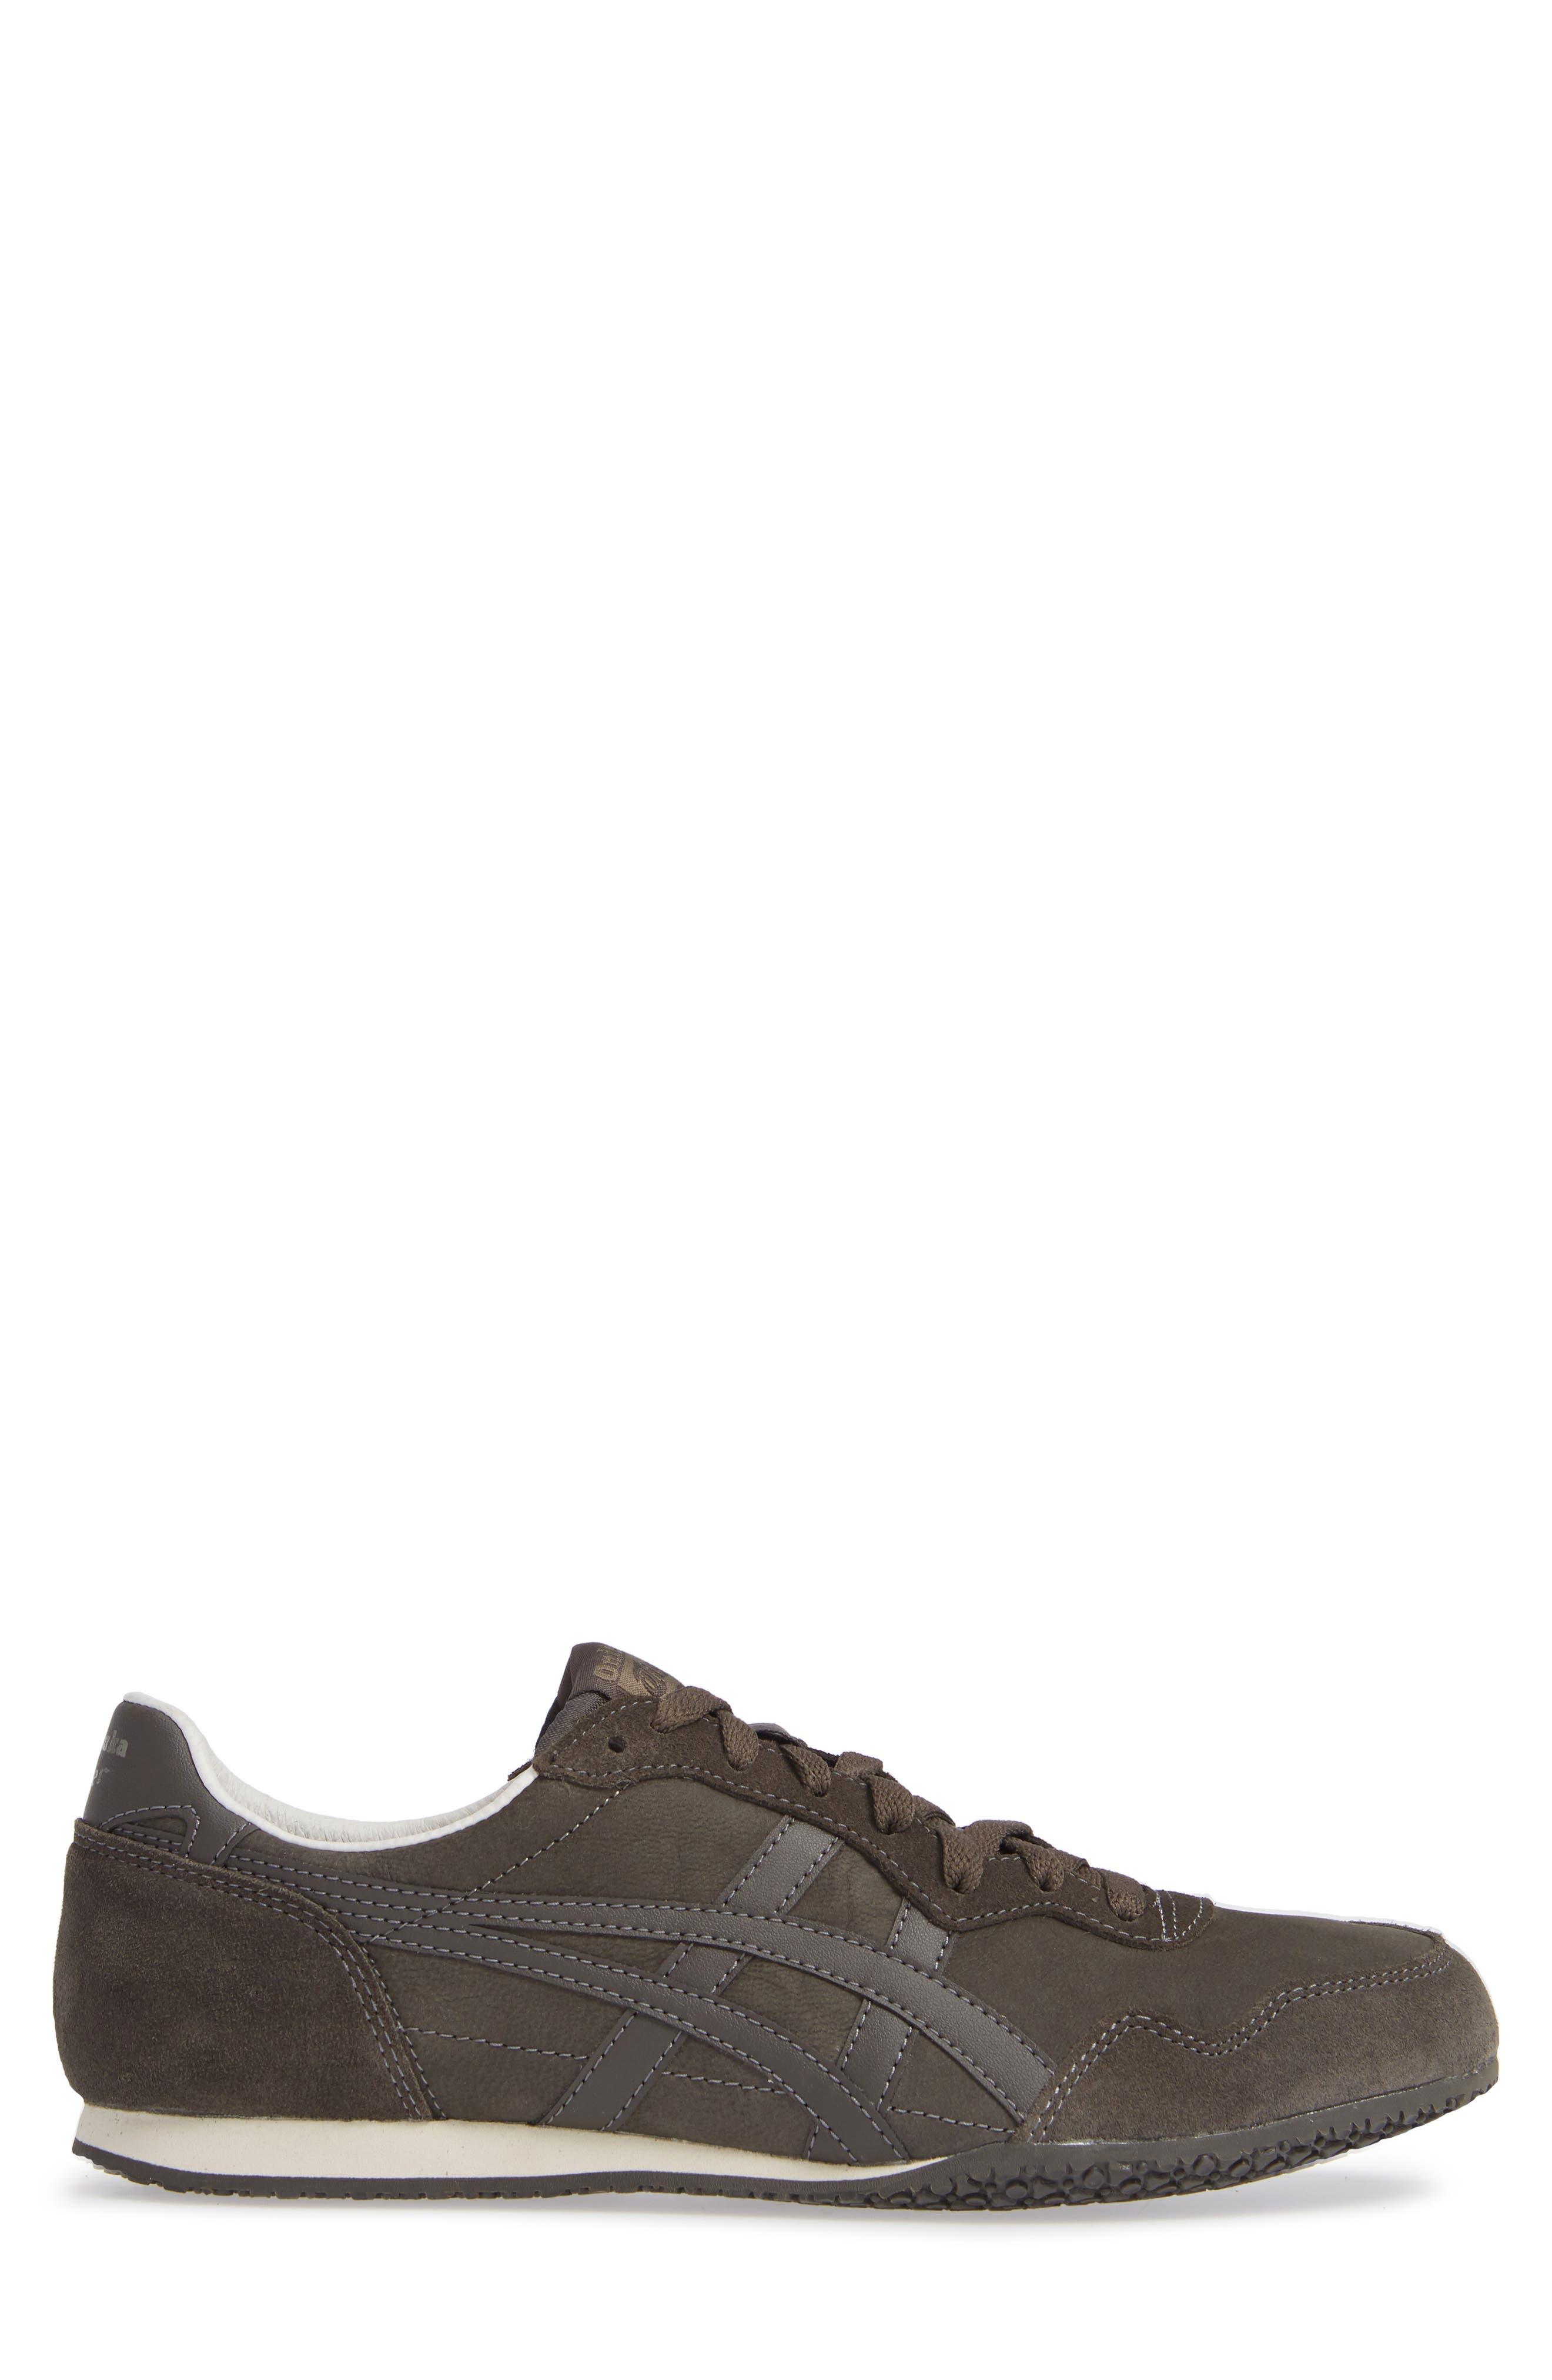 'Serrano' Sneaker,                             Alternate thumbnail 3, color,                             035